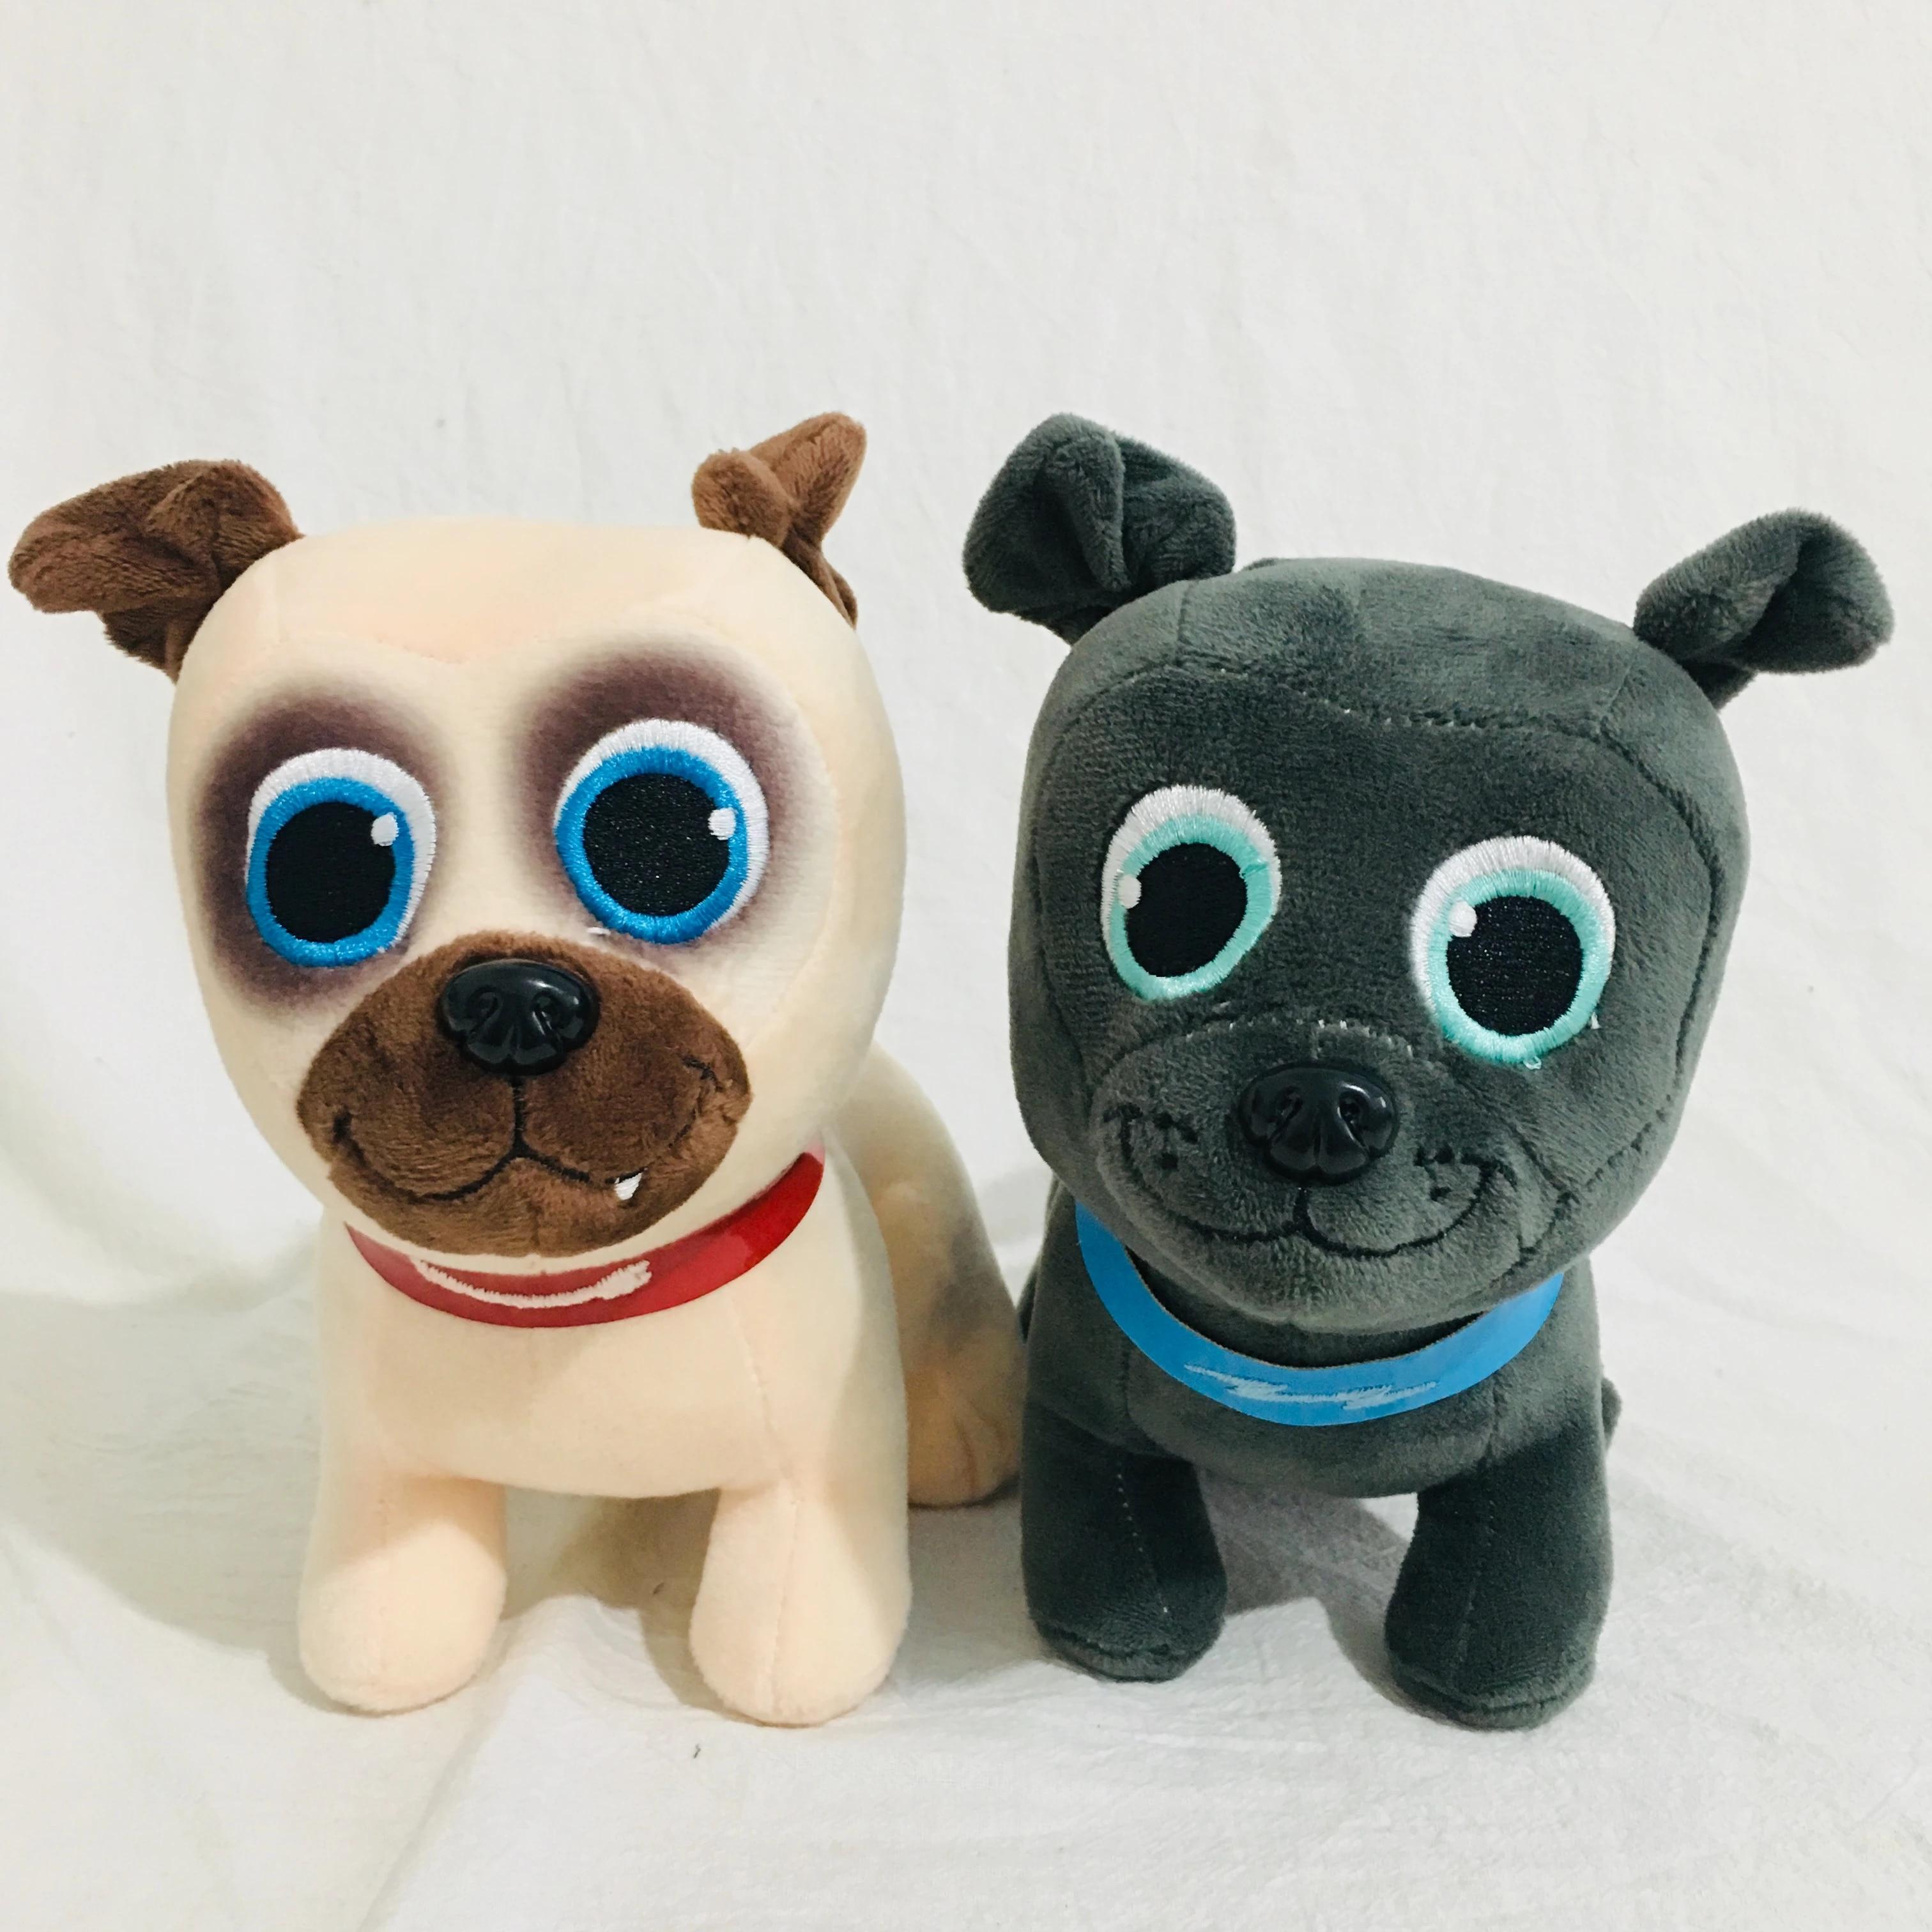 Set Of Dog Stuffed Animals, 2pcs Set 20cm Dog Bingo And Rolly Stuffed Animal Plush Toy Movies Tv Aliexpress